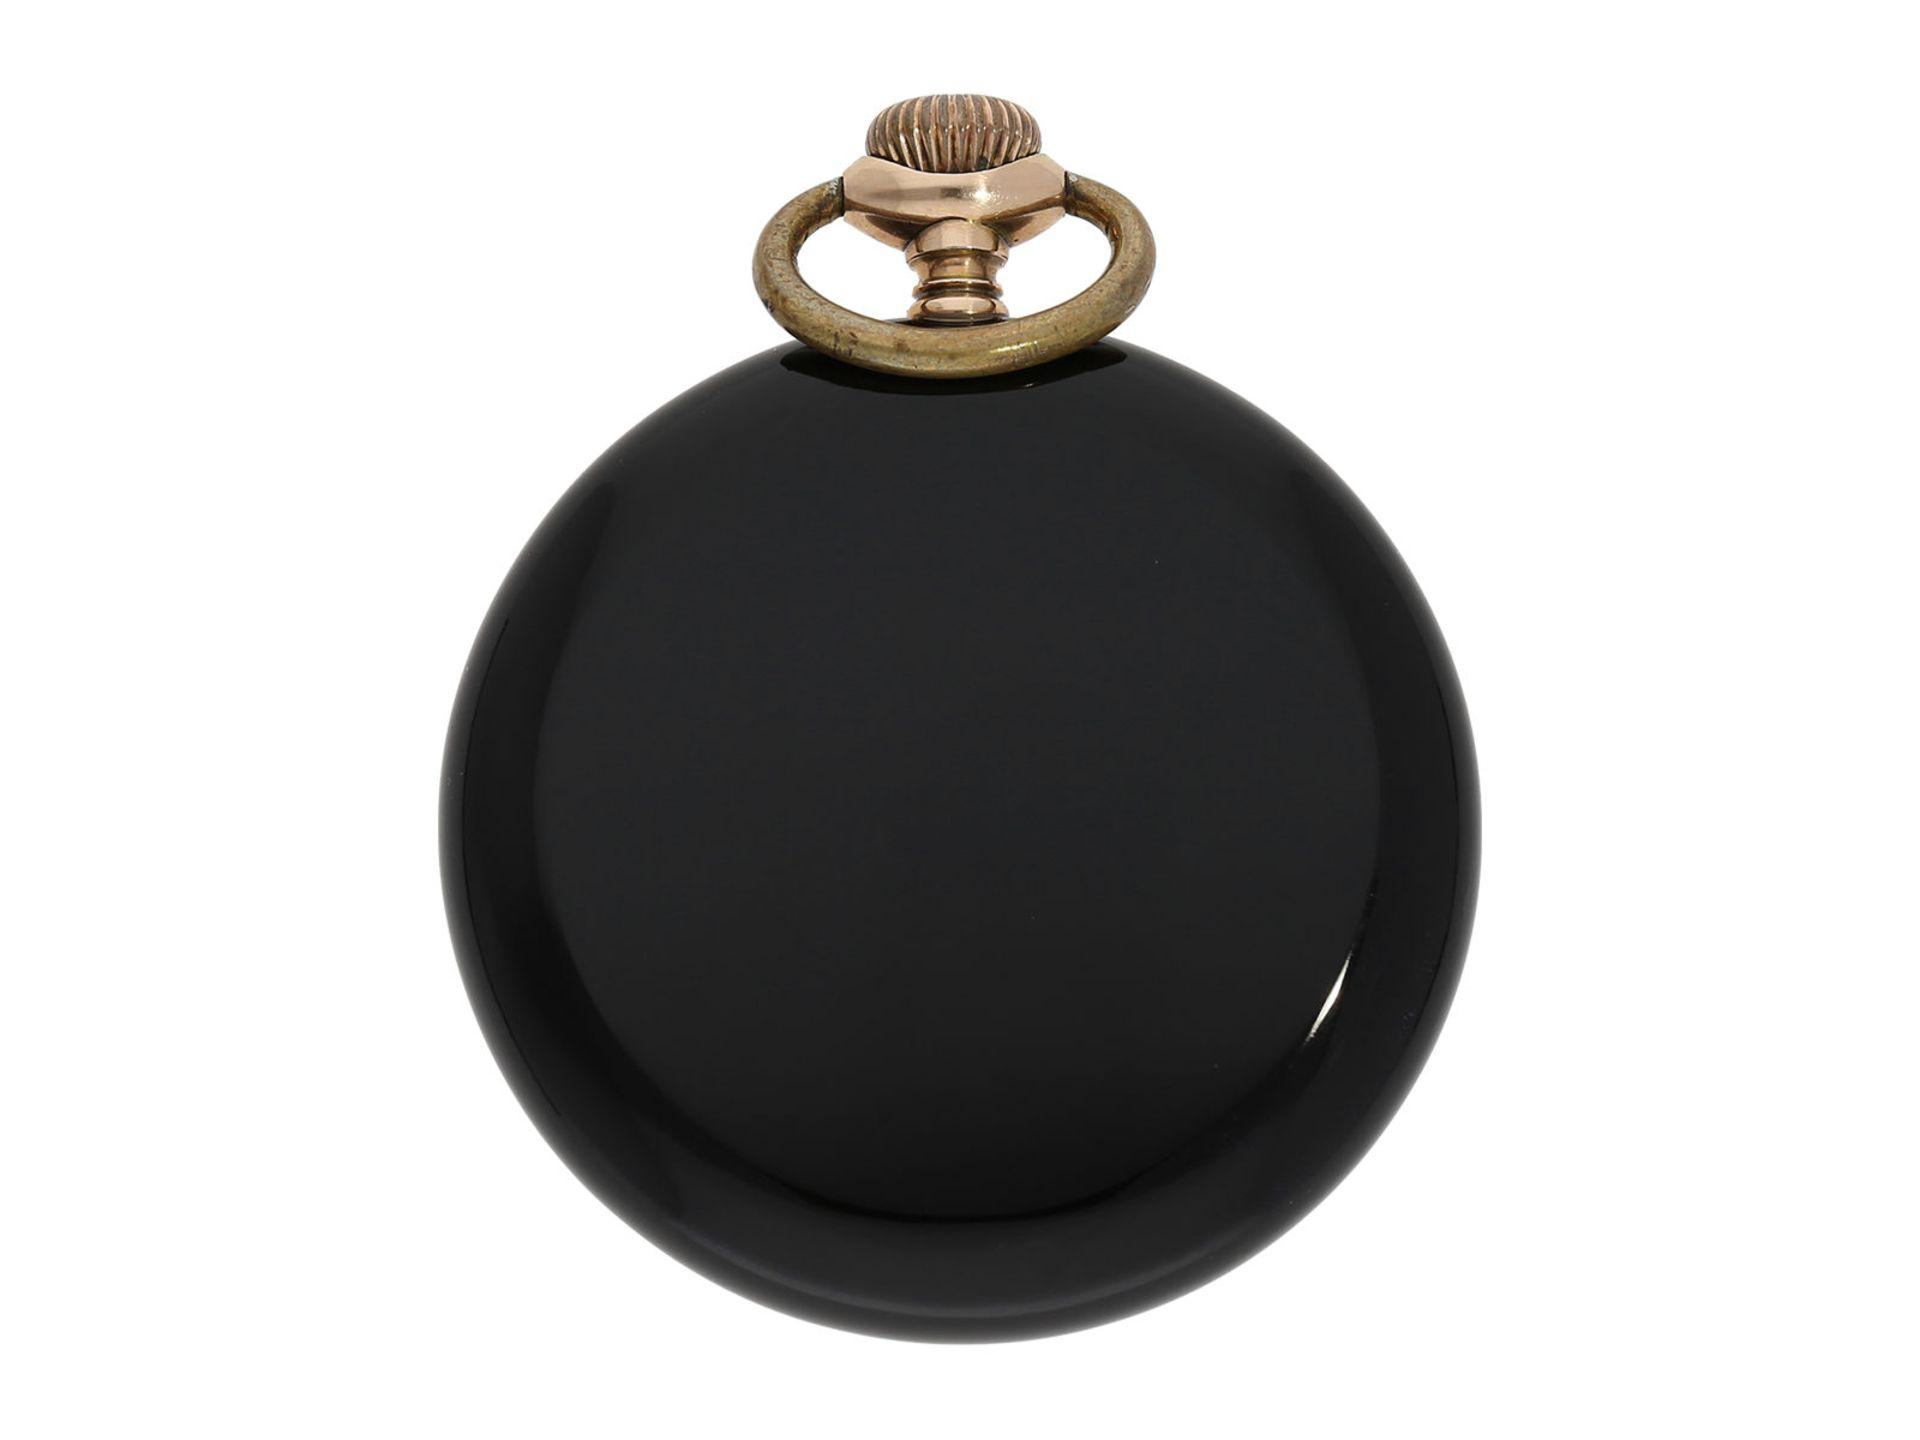 Pocket watch: chronometer Zenith in rare, perfectly preserved onyx case, ca. 1920 - Bild 3 aus 5